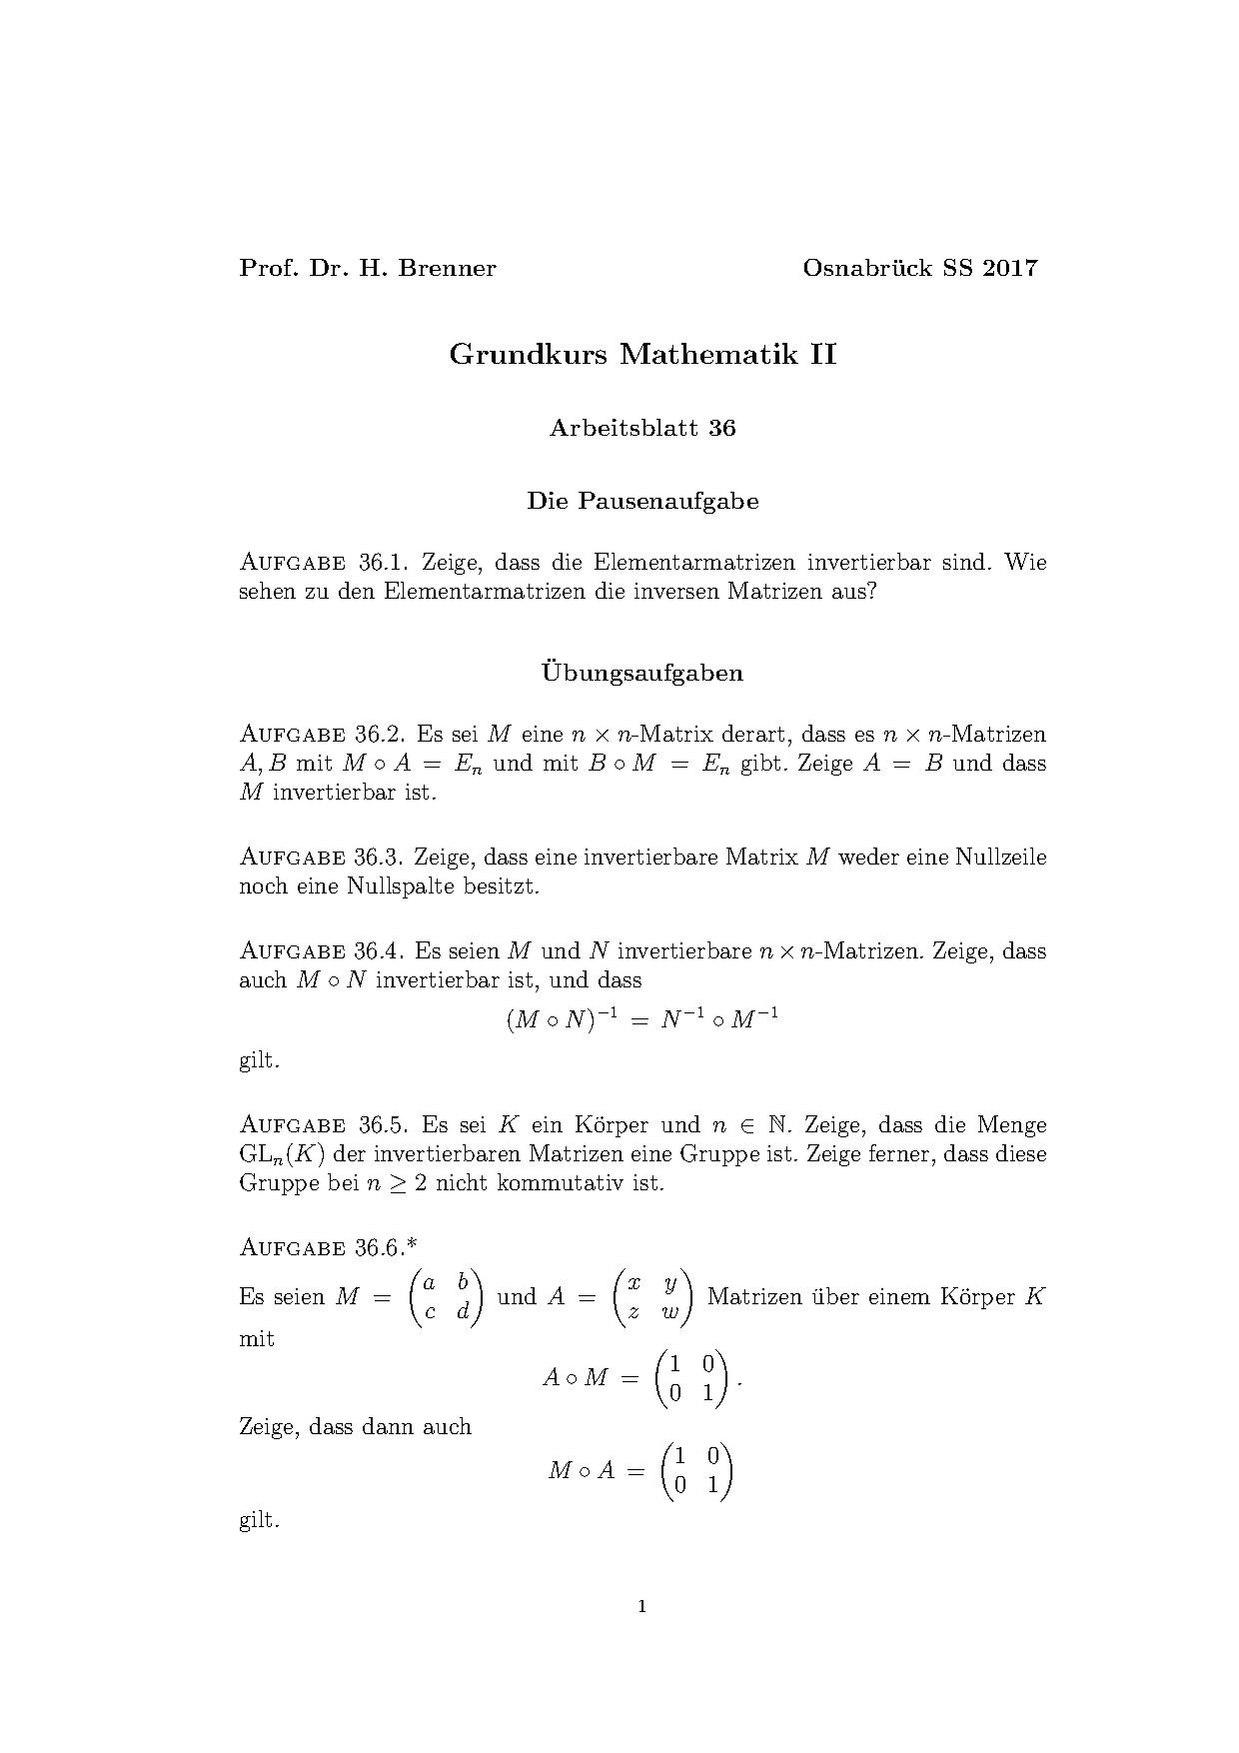 File:Grundkurs Mathematik (Osnabrück 2016-2017)Teil IIArbeitsblatt36 ...